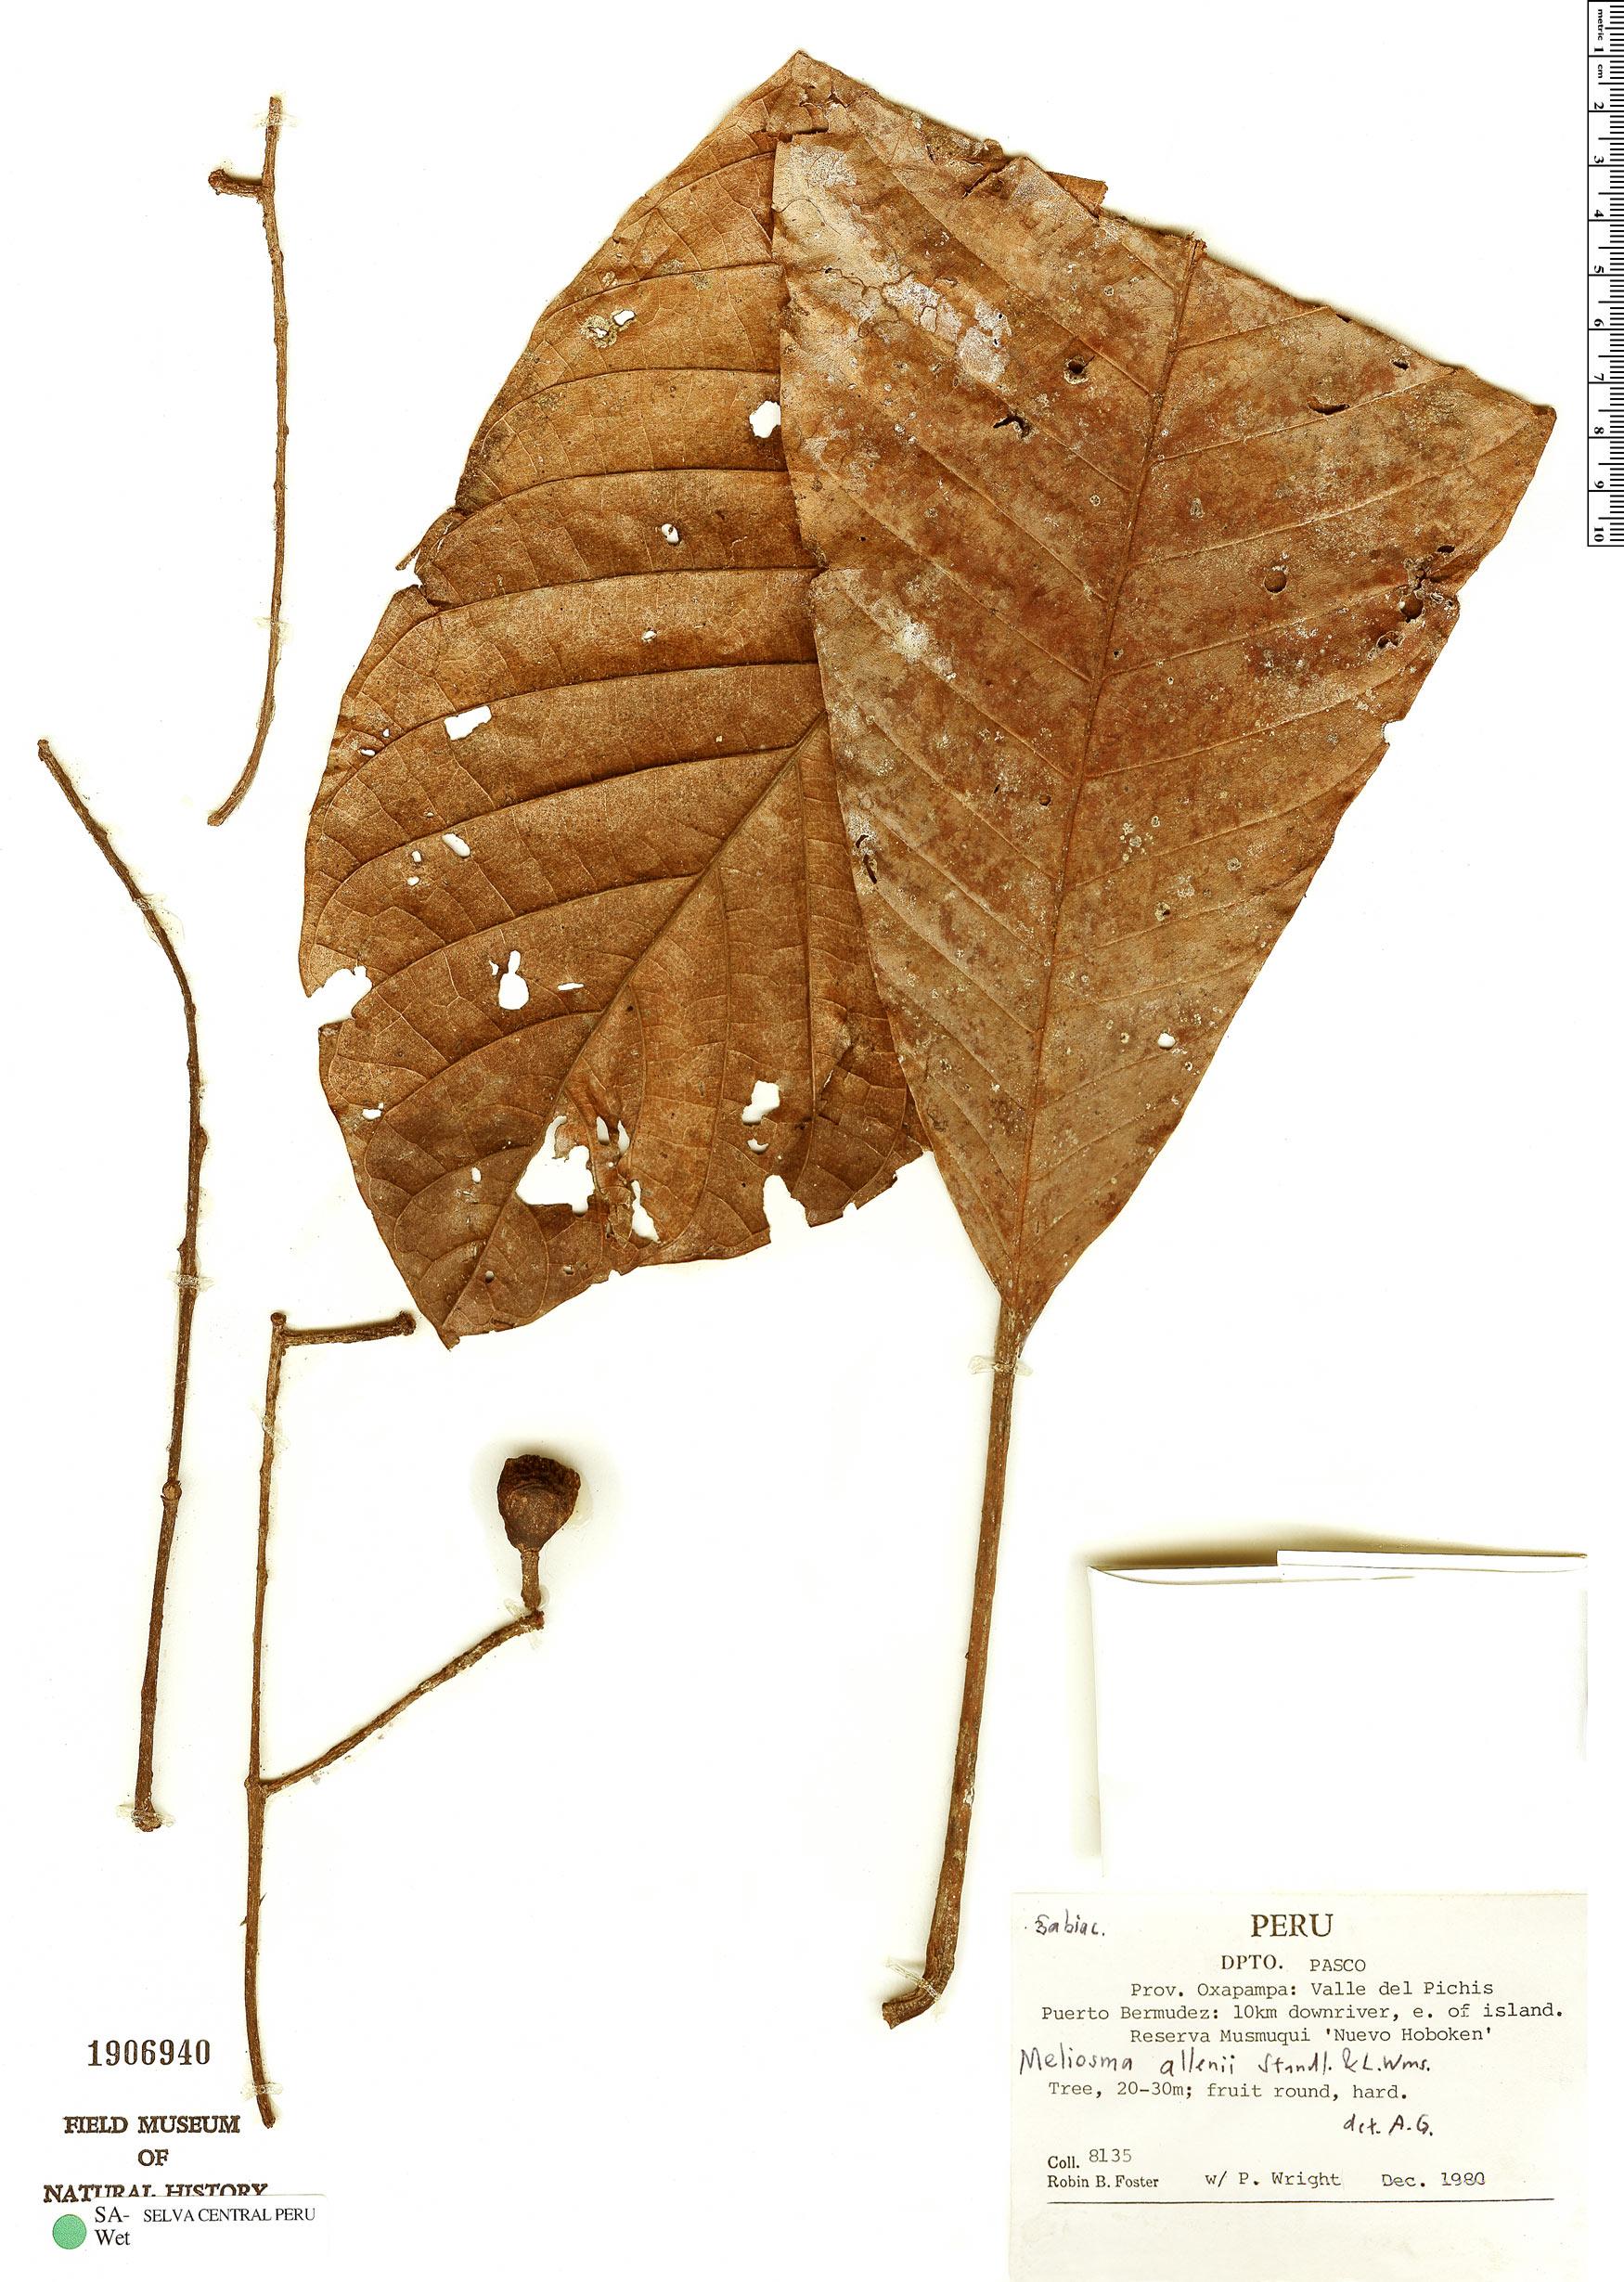 Specimen: Meliosma palaciosii